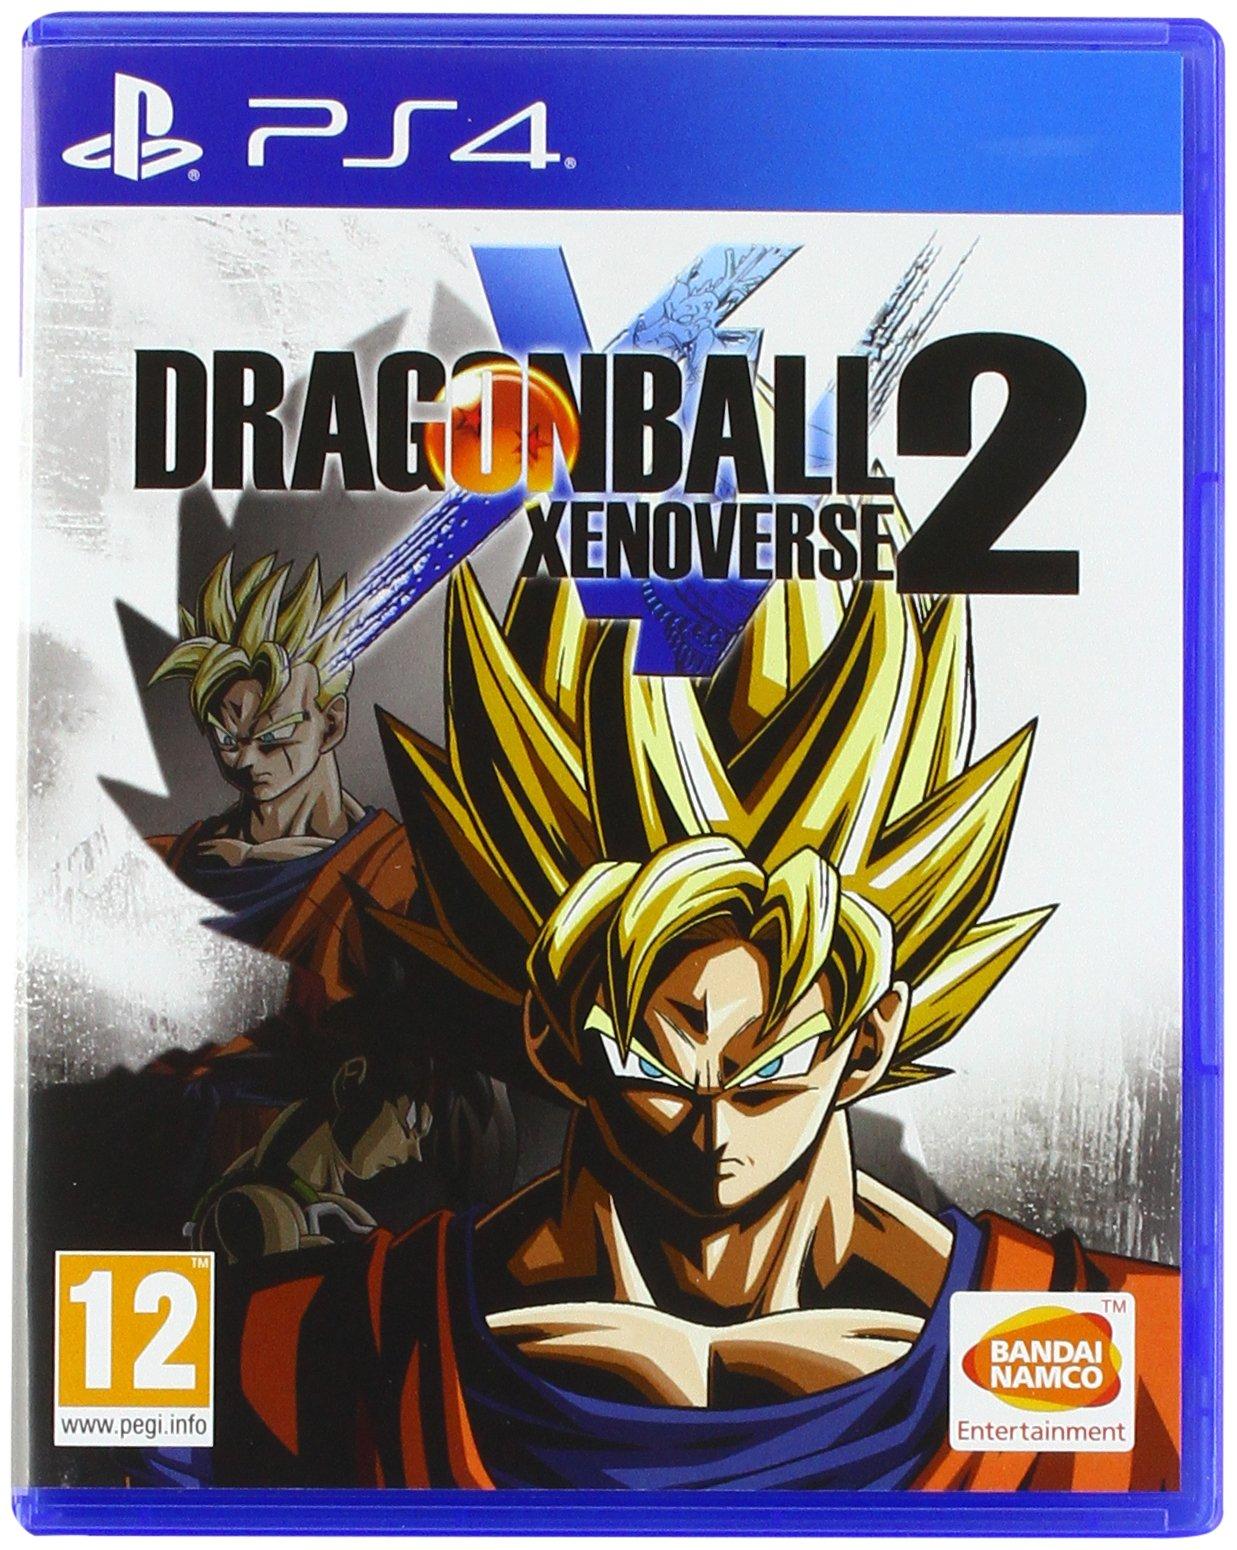 Videojuegos Dragon Ball